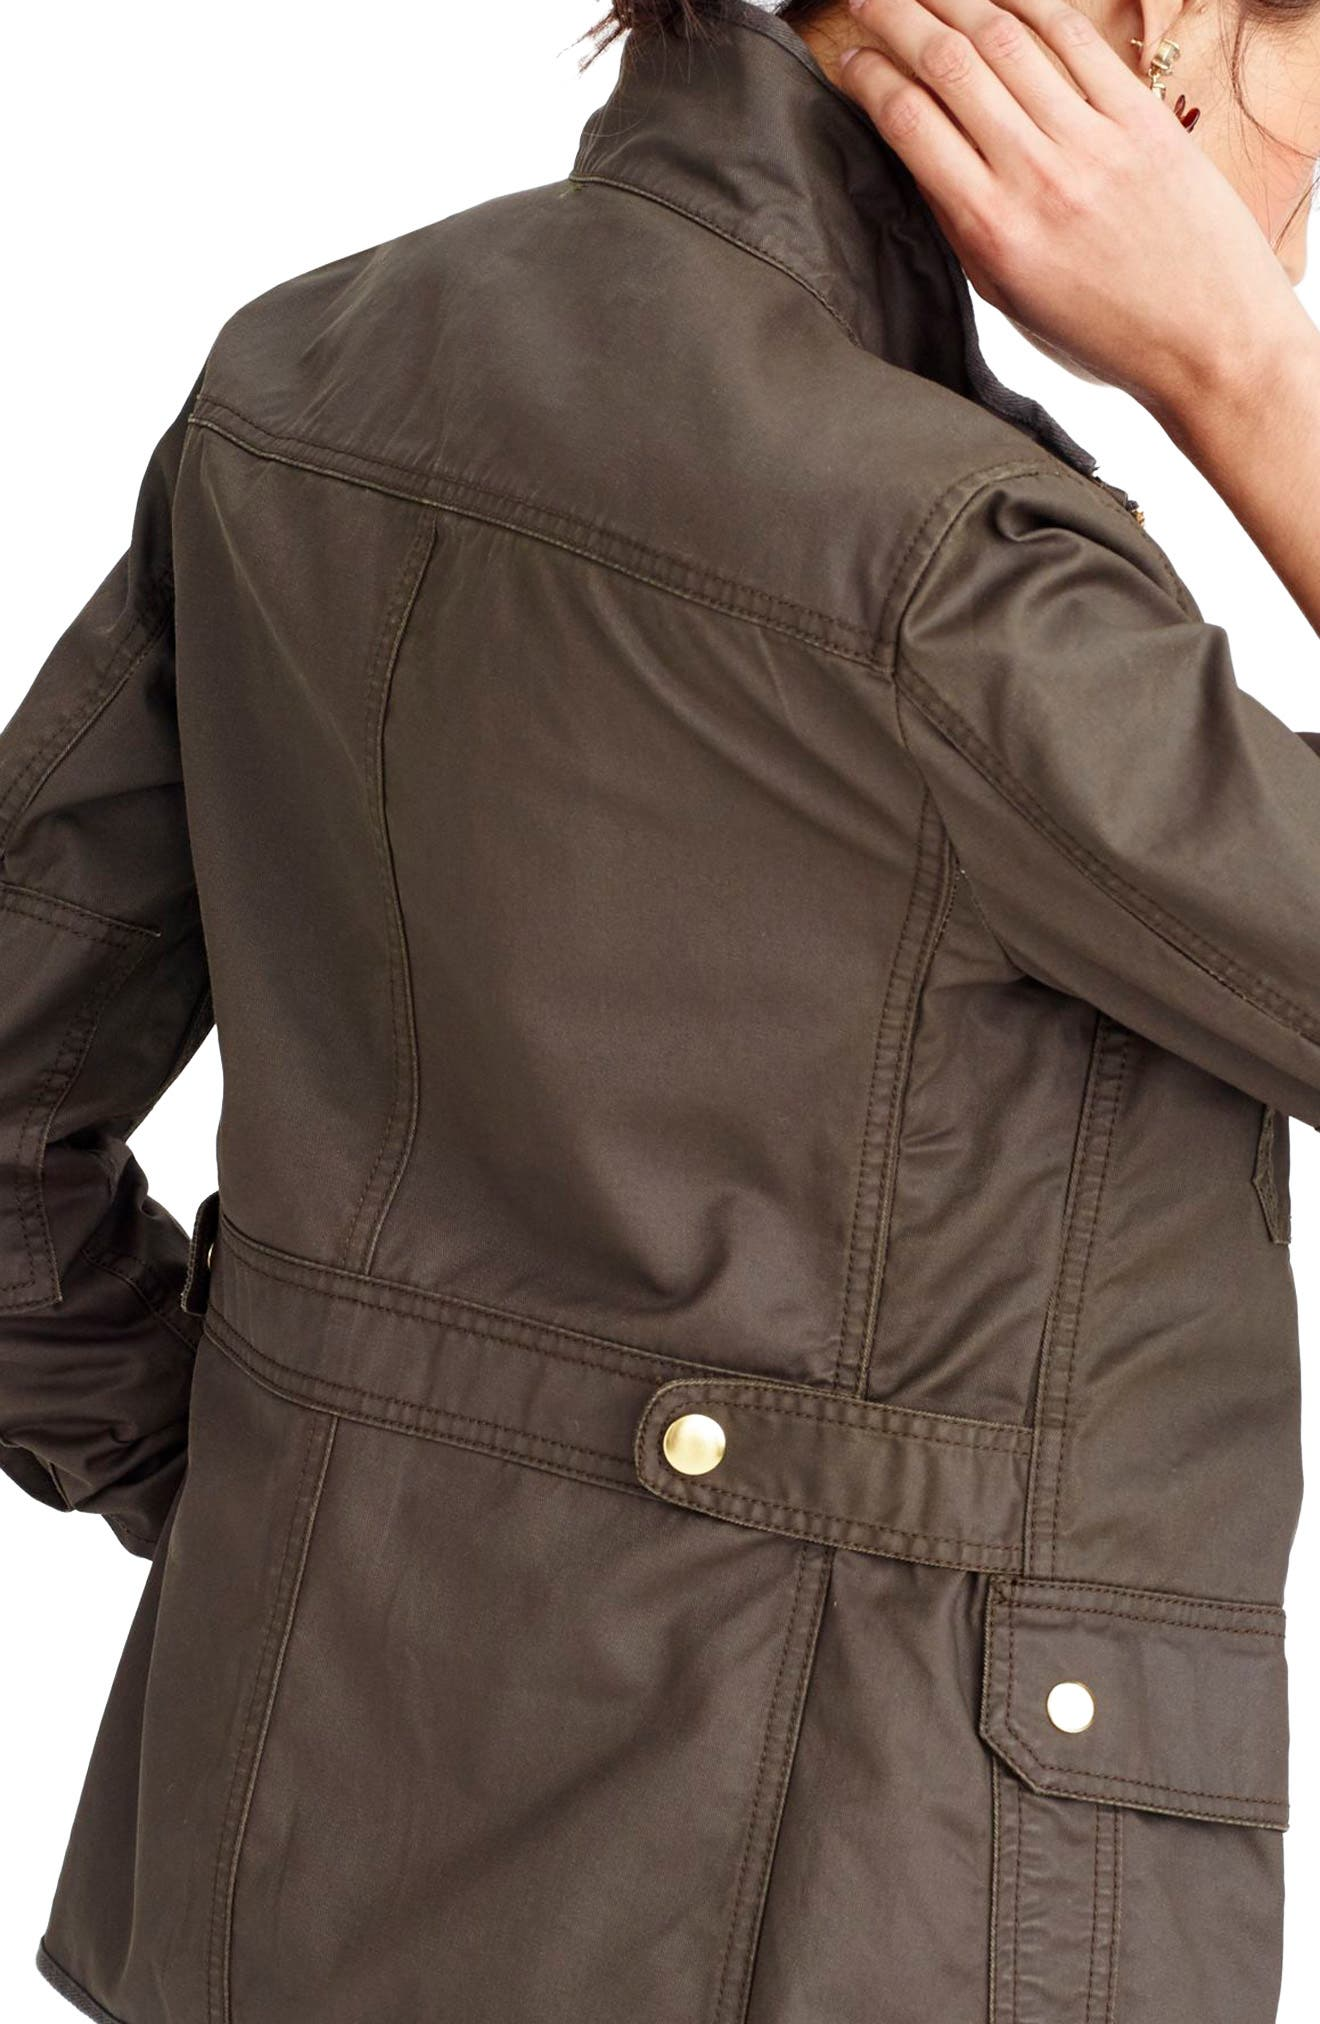 J.CREW Downtown Field Jacket in Mossy Brown